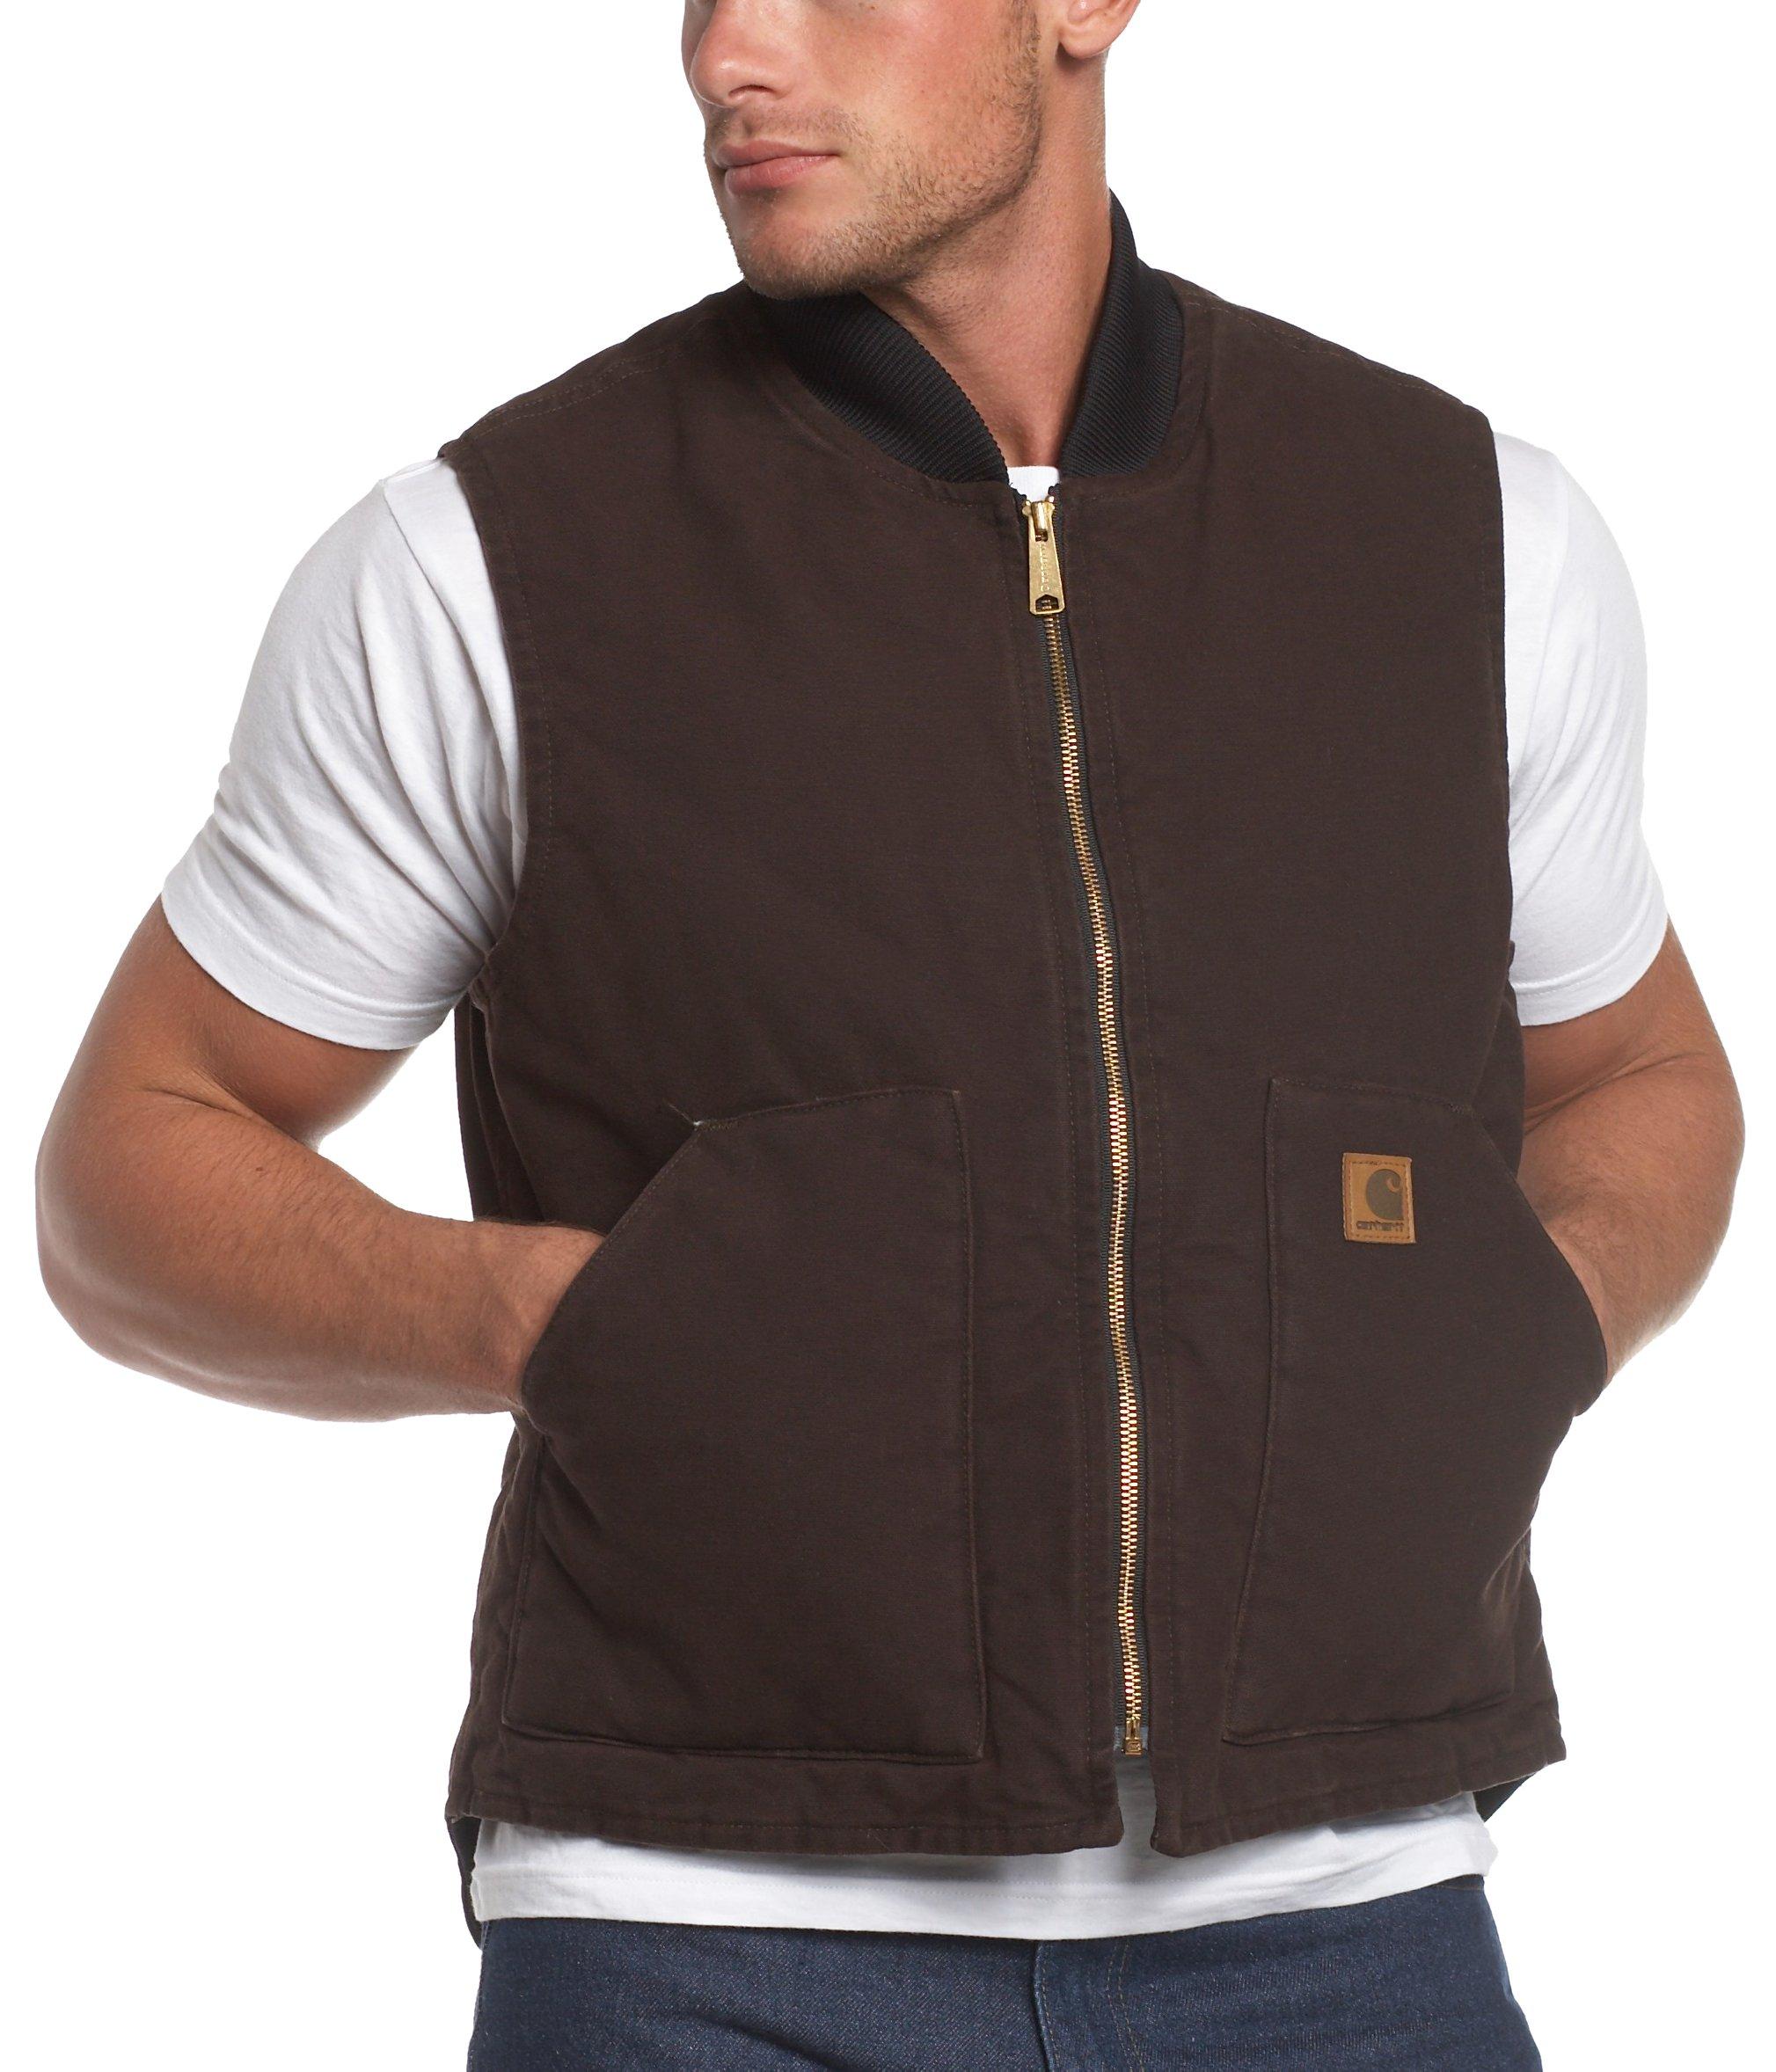 Carhartt Men's Sandstone Vest Arctic Quilt Lined,Dark Brown,Large